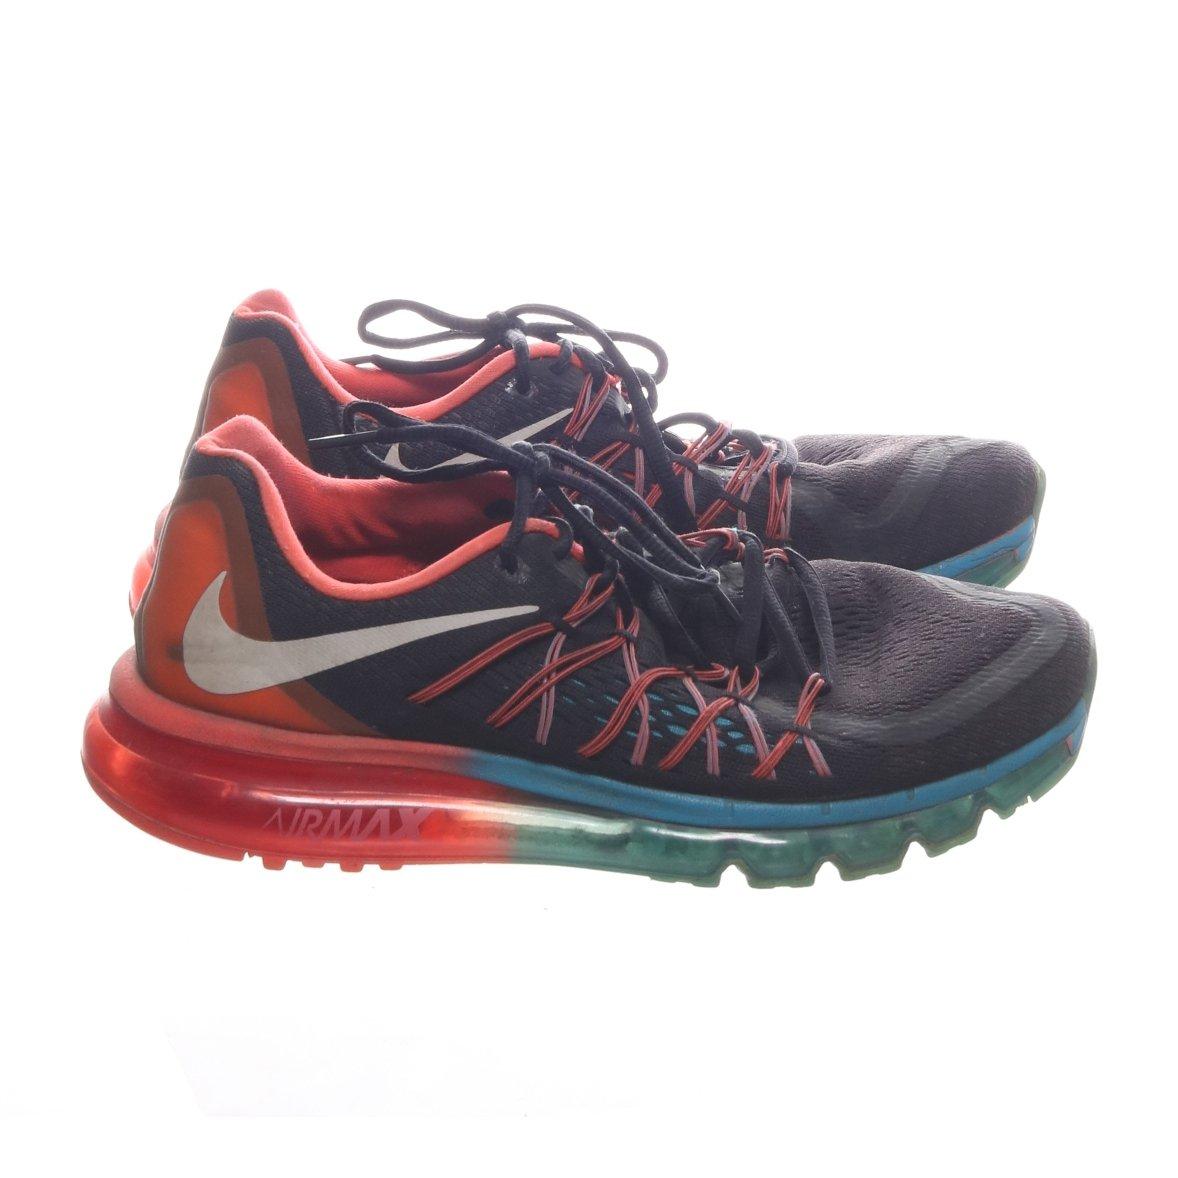 Nike, Träningsskor, Strl: 42, Air Max 2015 'Black Bright Crimson', Svart